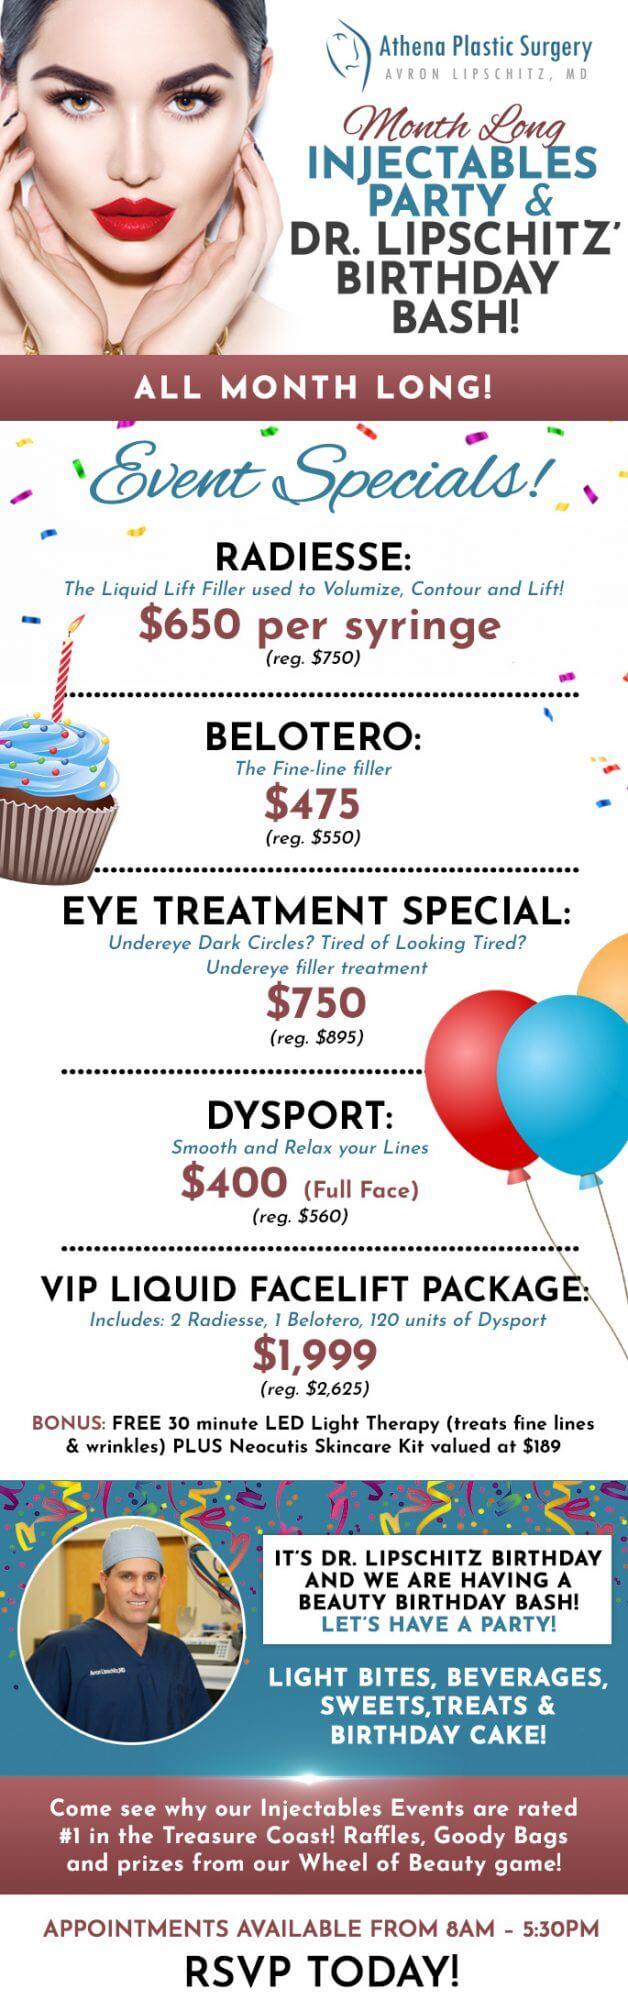 , Month Injectable Event & Dr. Lipschitz' Birthday Bash!